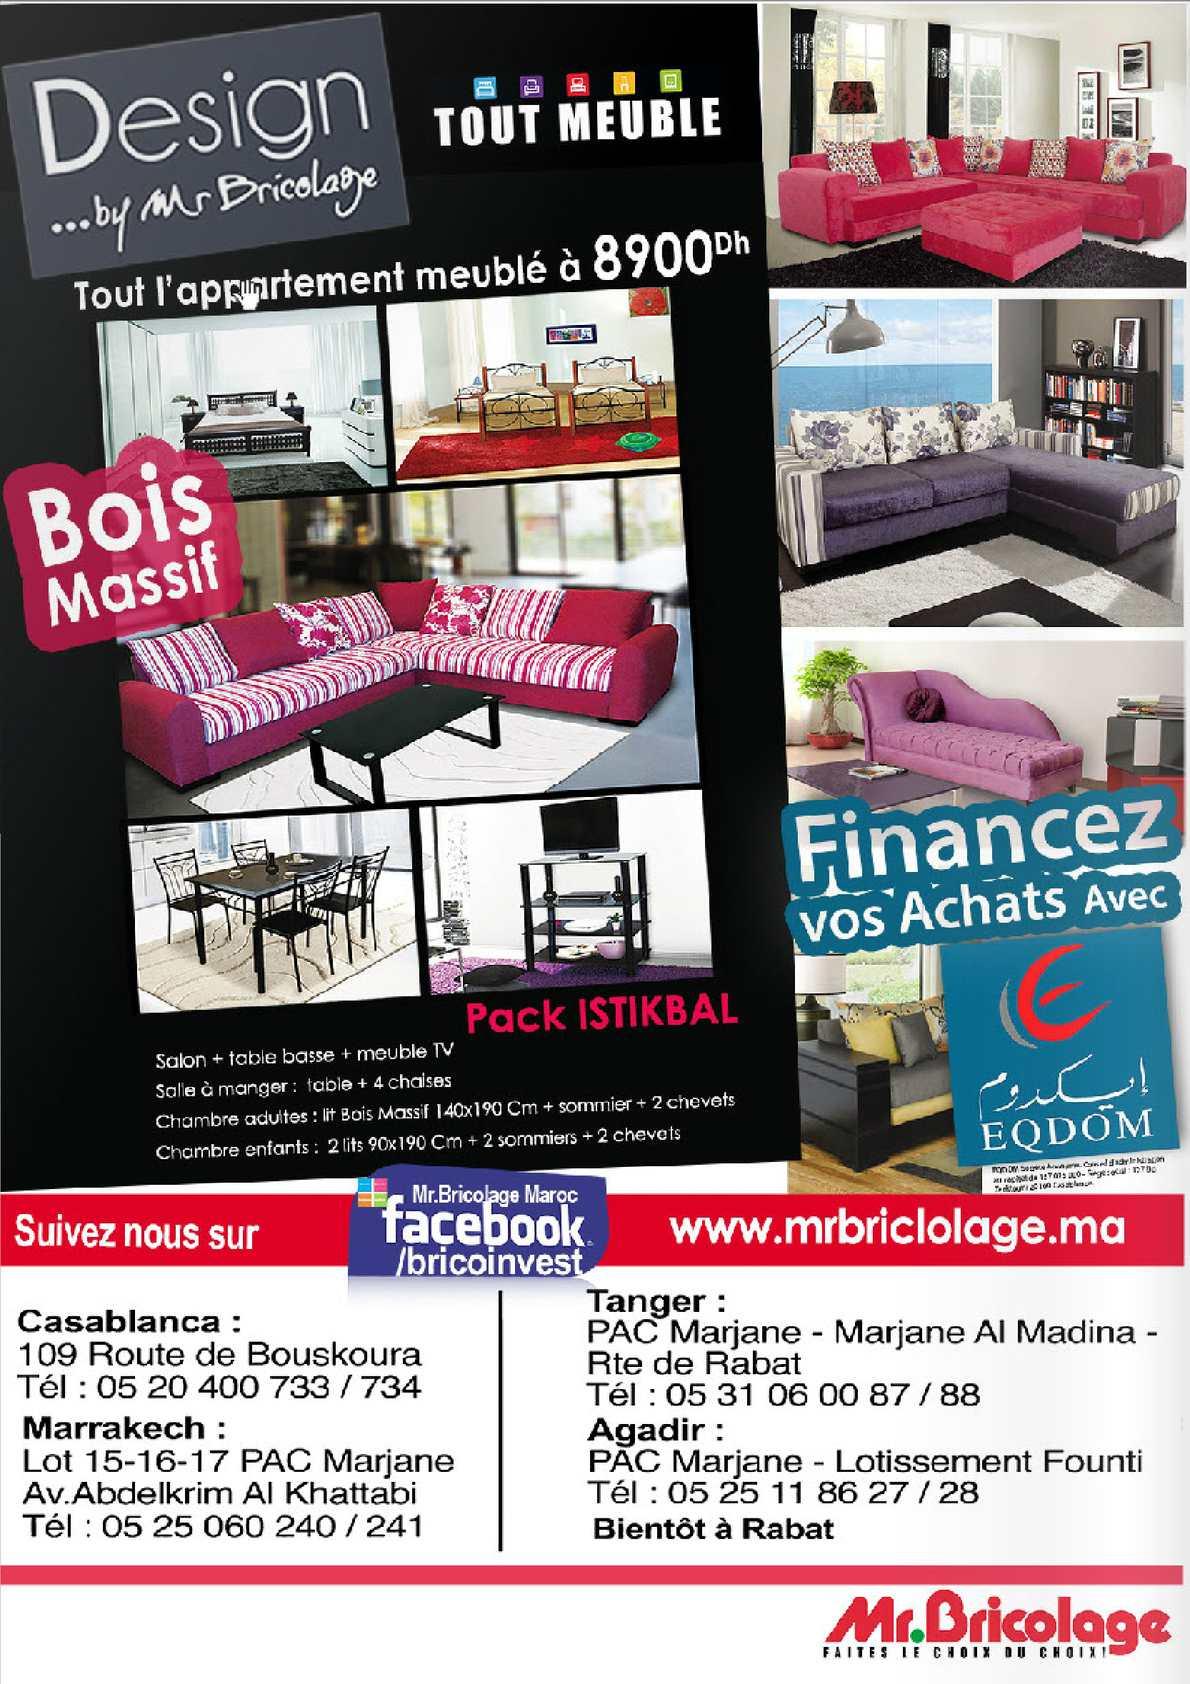 Mr Bricolage Maroc 2015 Calameo Downloader